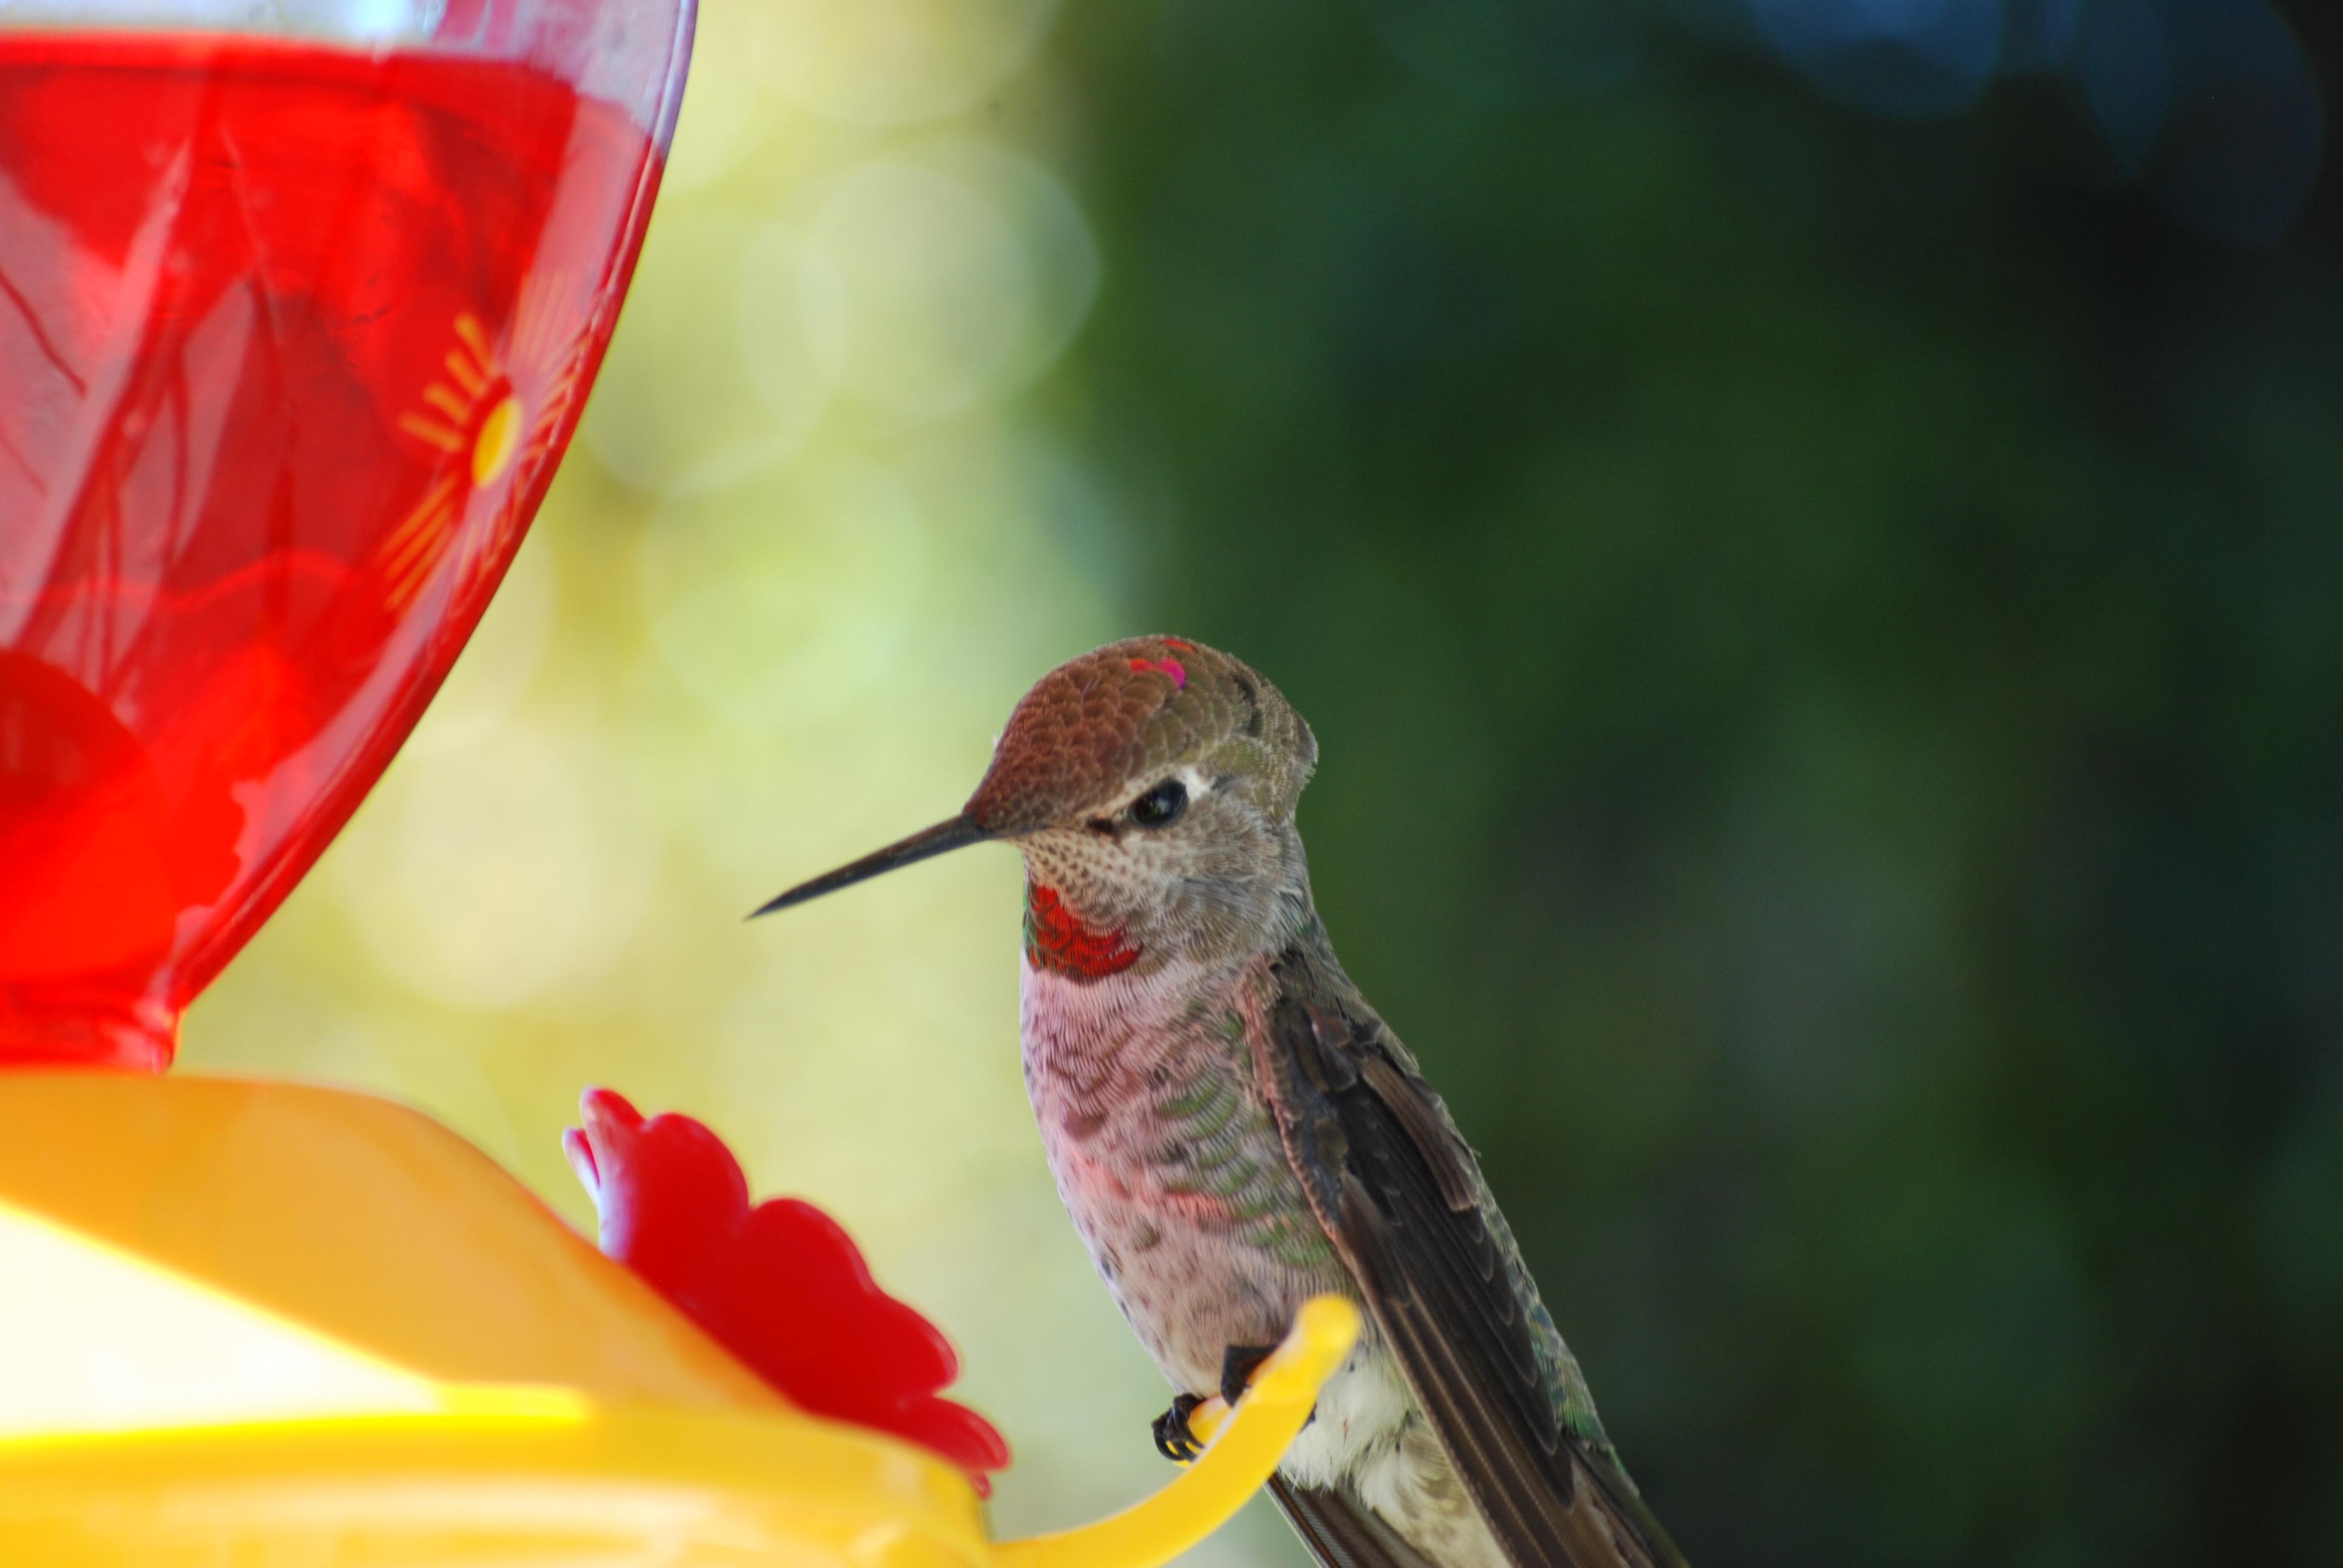 HummingbirdatFeeder